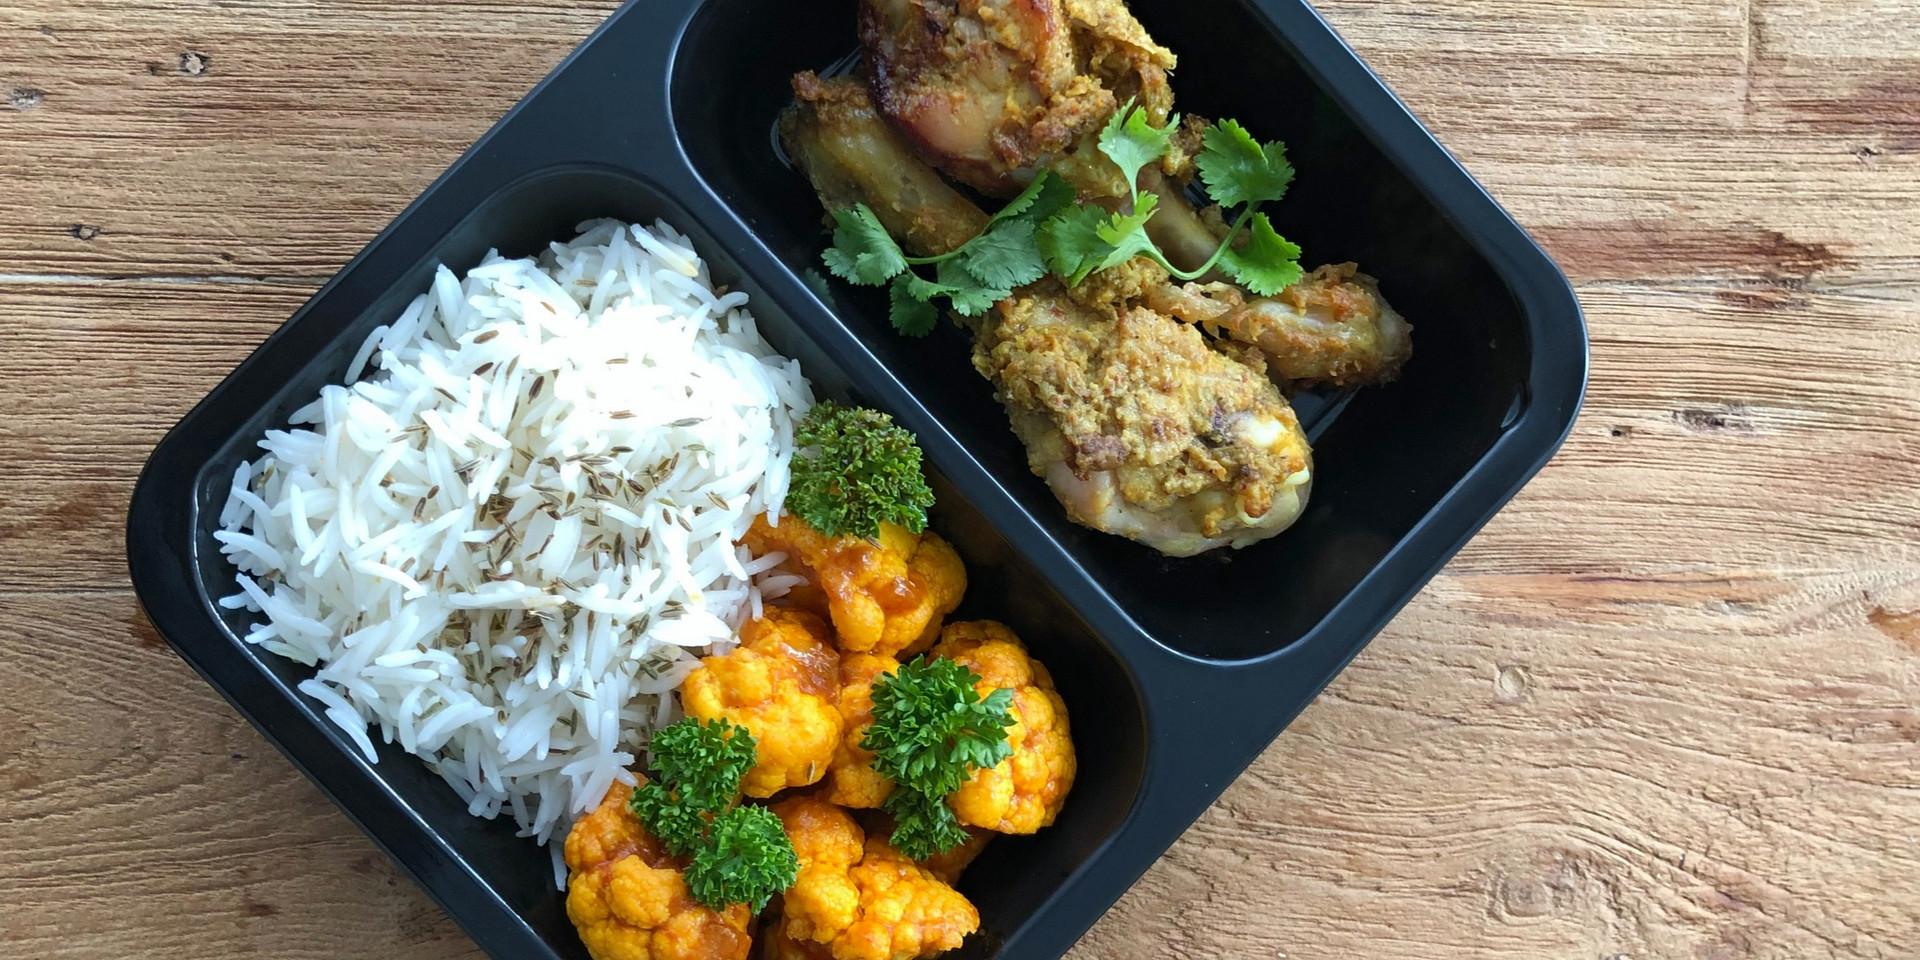 Witte basmati rijst met gekruidde kippen